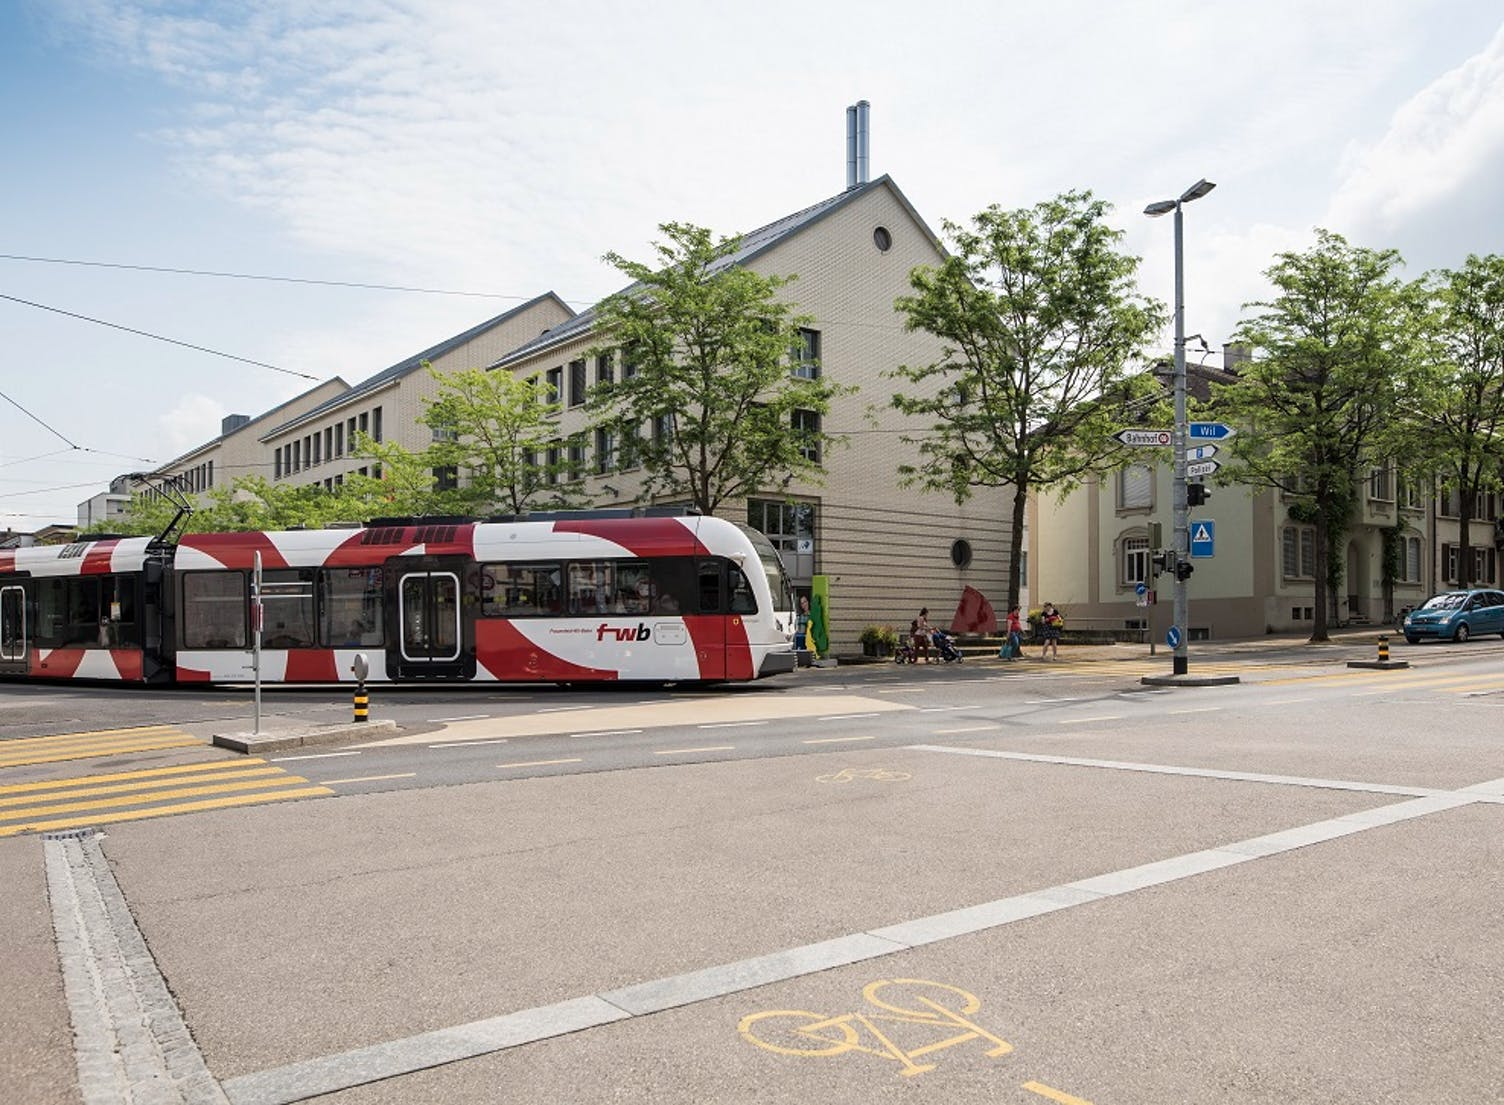 Frauenfeld-Wil Bahn